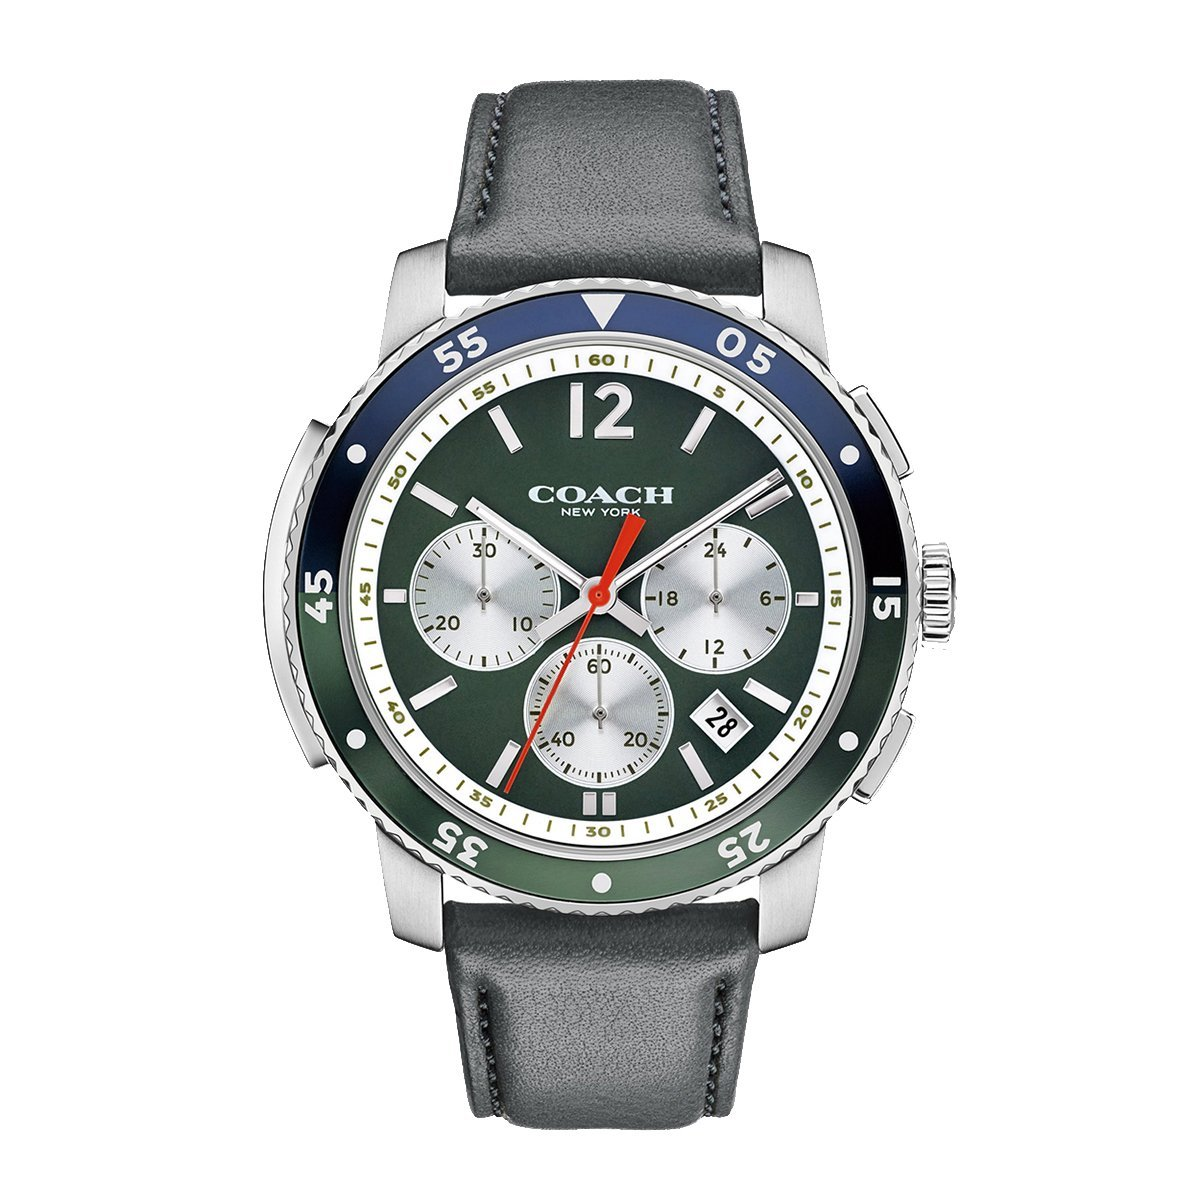 854b838340 COACH Men's Bleecker Sport Leather Surplus Green Sandblast Watch